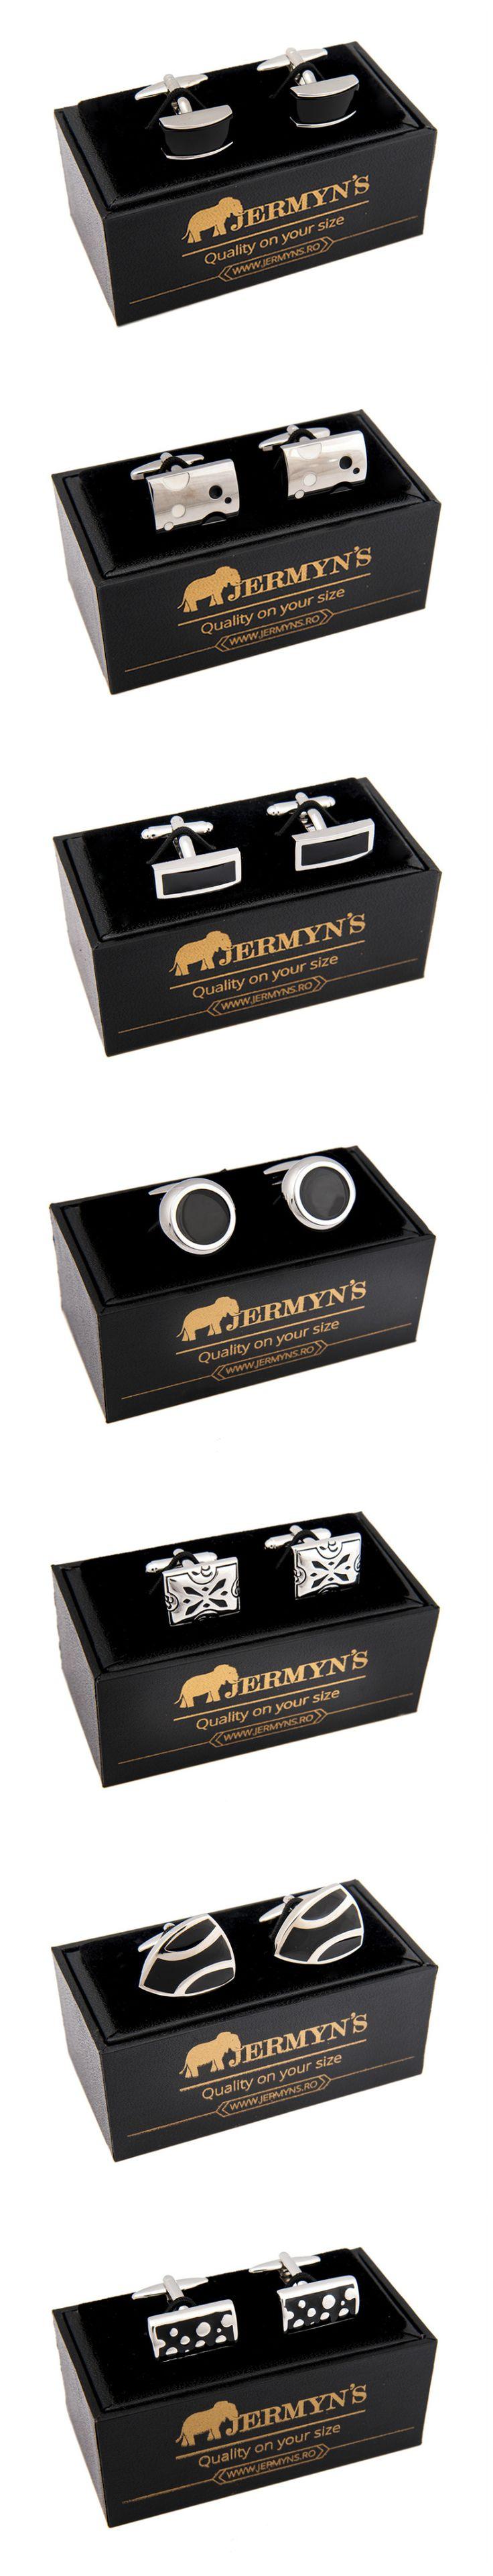 Jermyn's Cufflinks